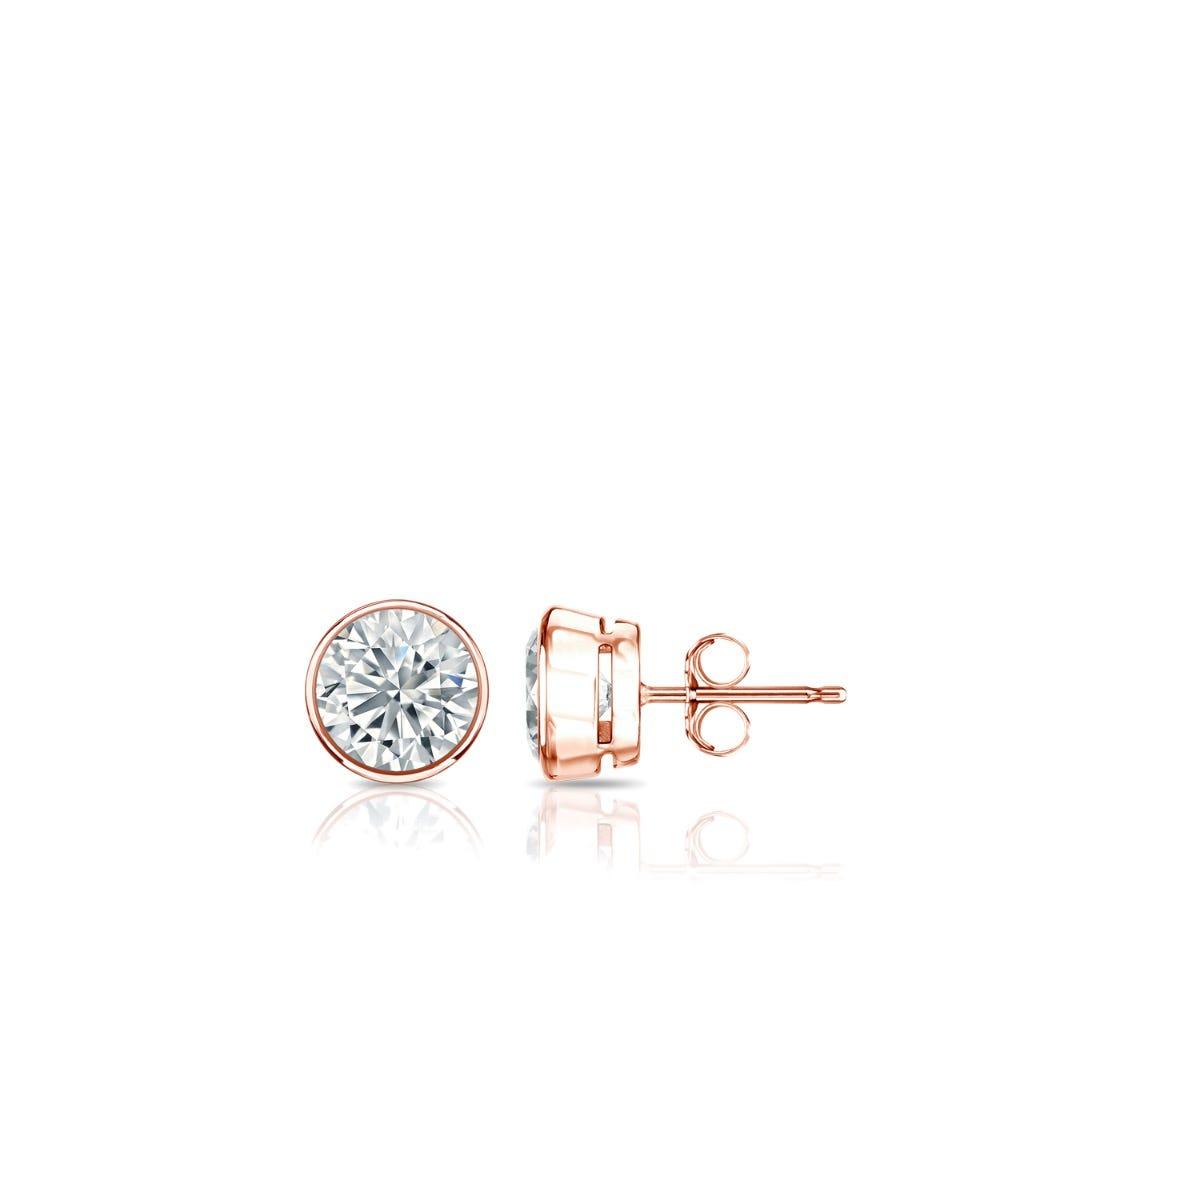 Diamond Round Bezel-Set 1/5ctw. Solitaire Stud (IJ-I1) Earrings in 14K Rose Gold